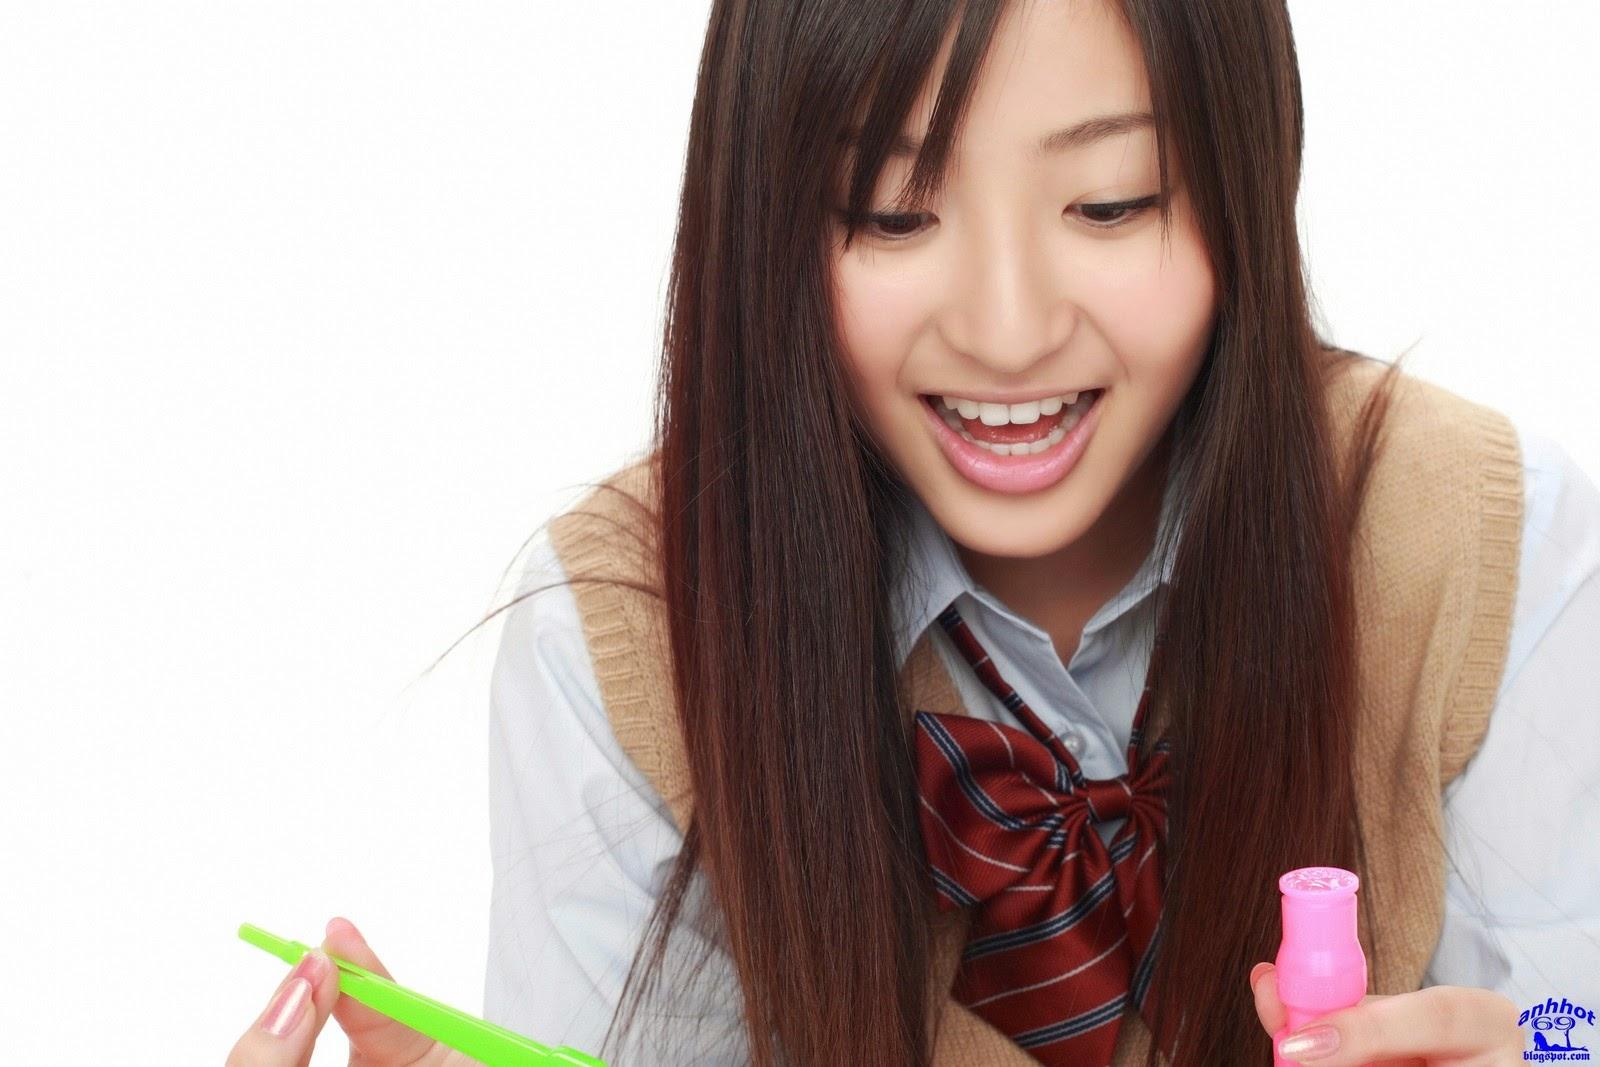 yuri-murakami-00562583